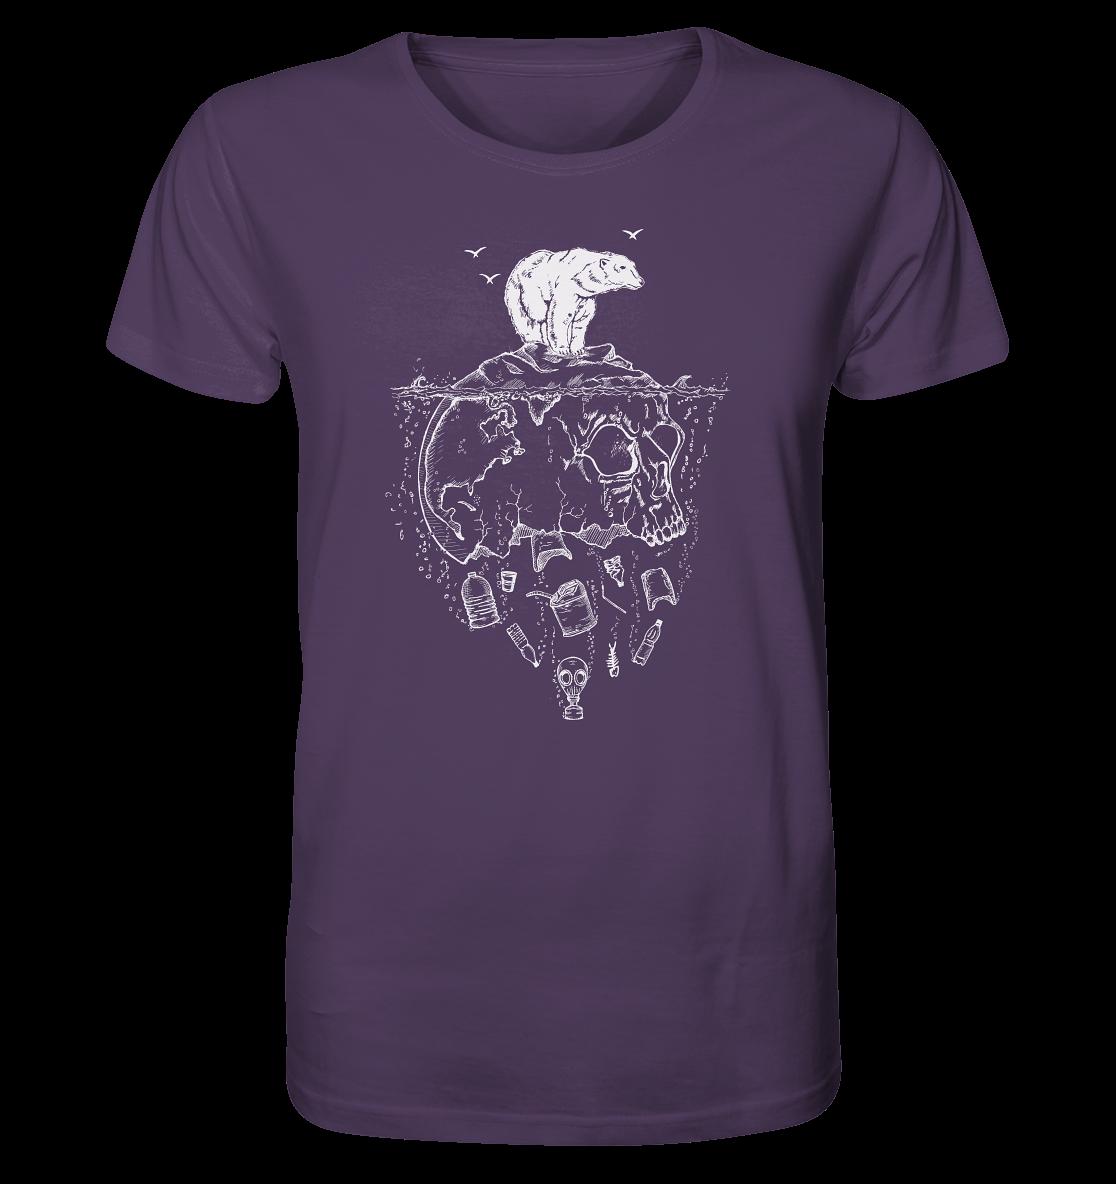 front-organic-shirt-523f5f-1116x-5.png